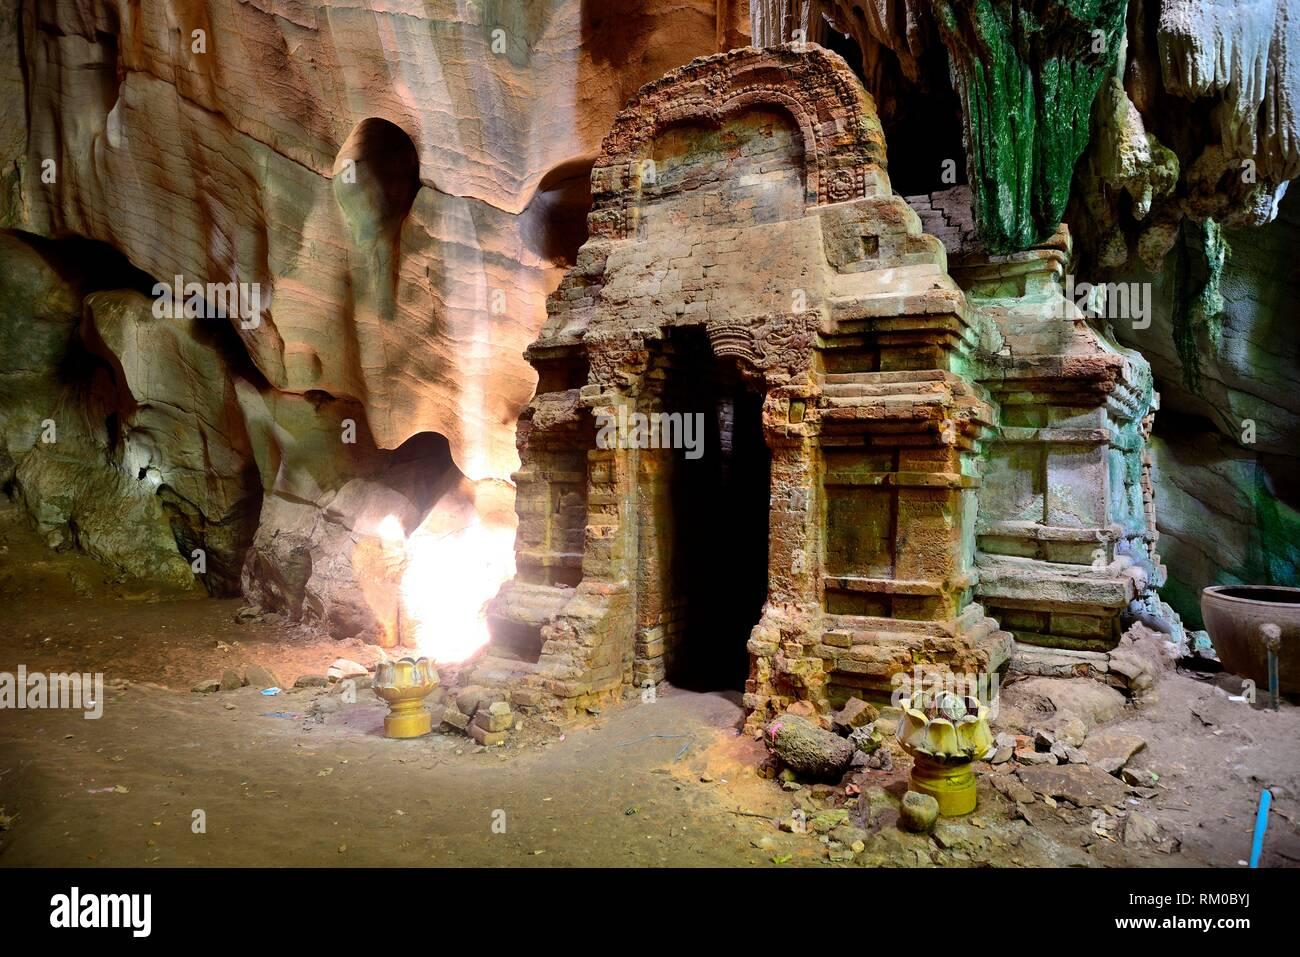 Pre-Angkorian prasat in Phnom Chhngok cave, Kampot province, Cambodia. - Stock Image